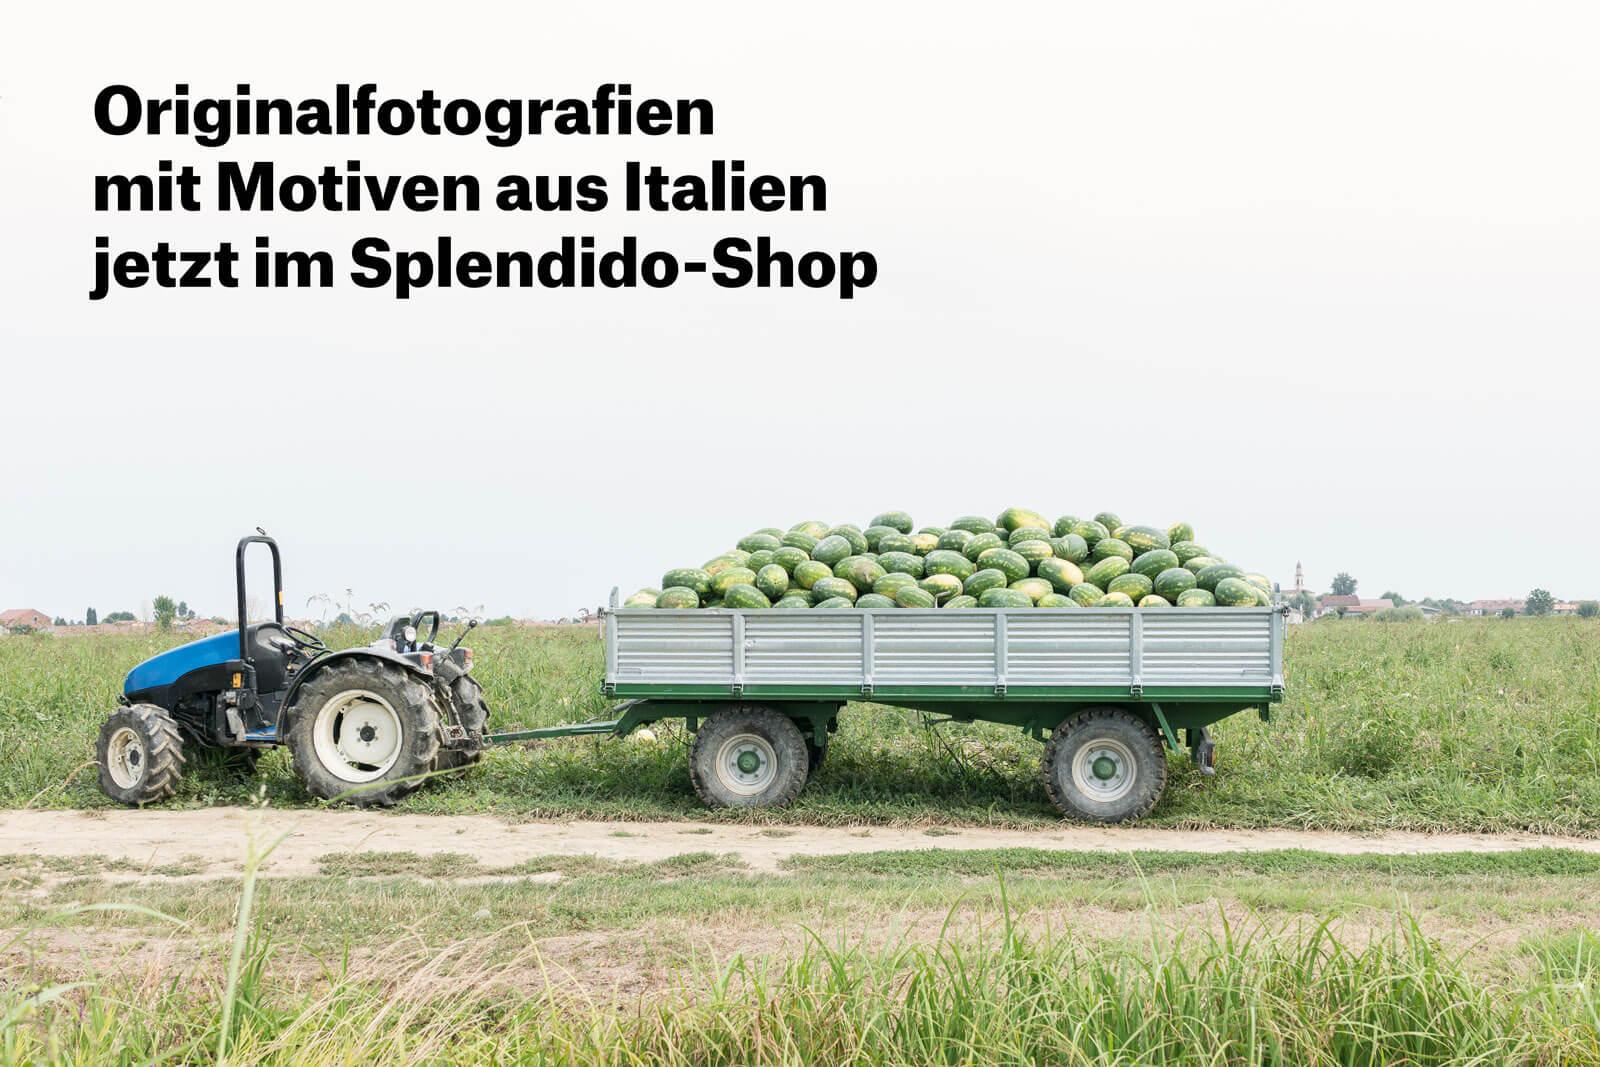 Splendido-Shop